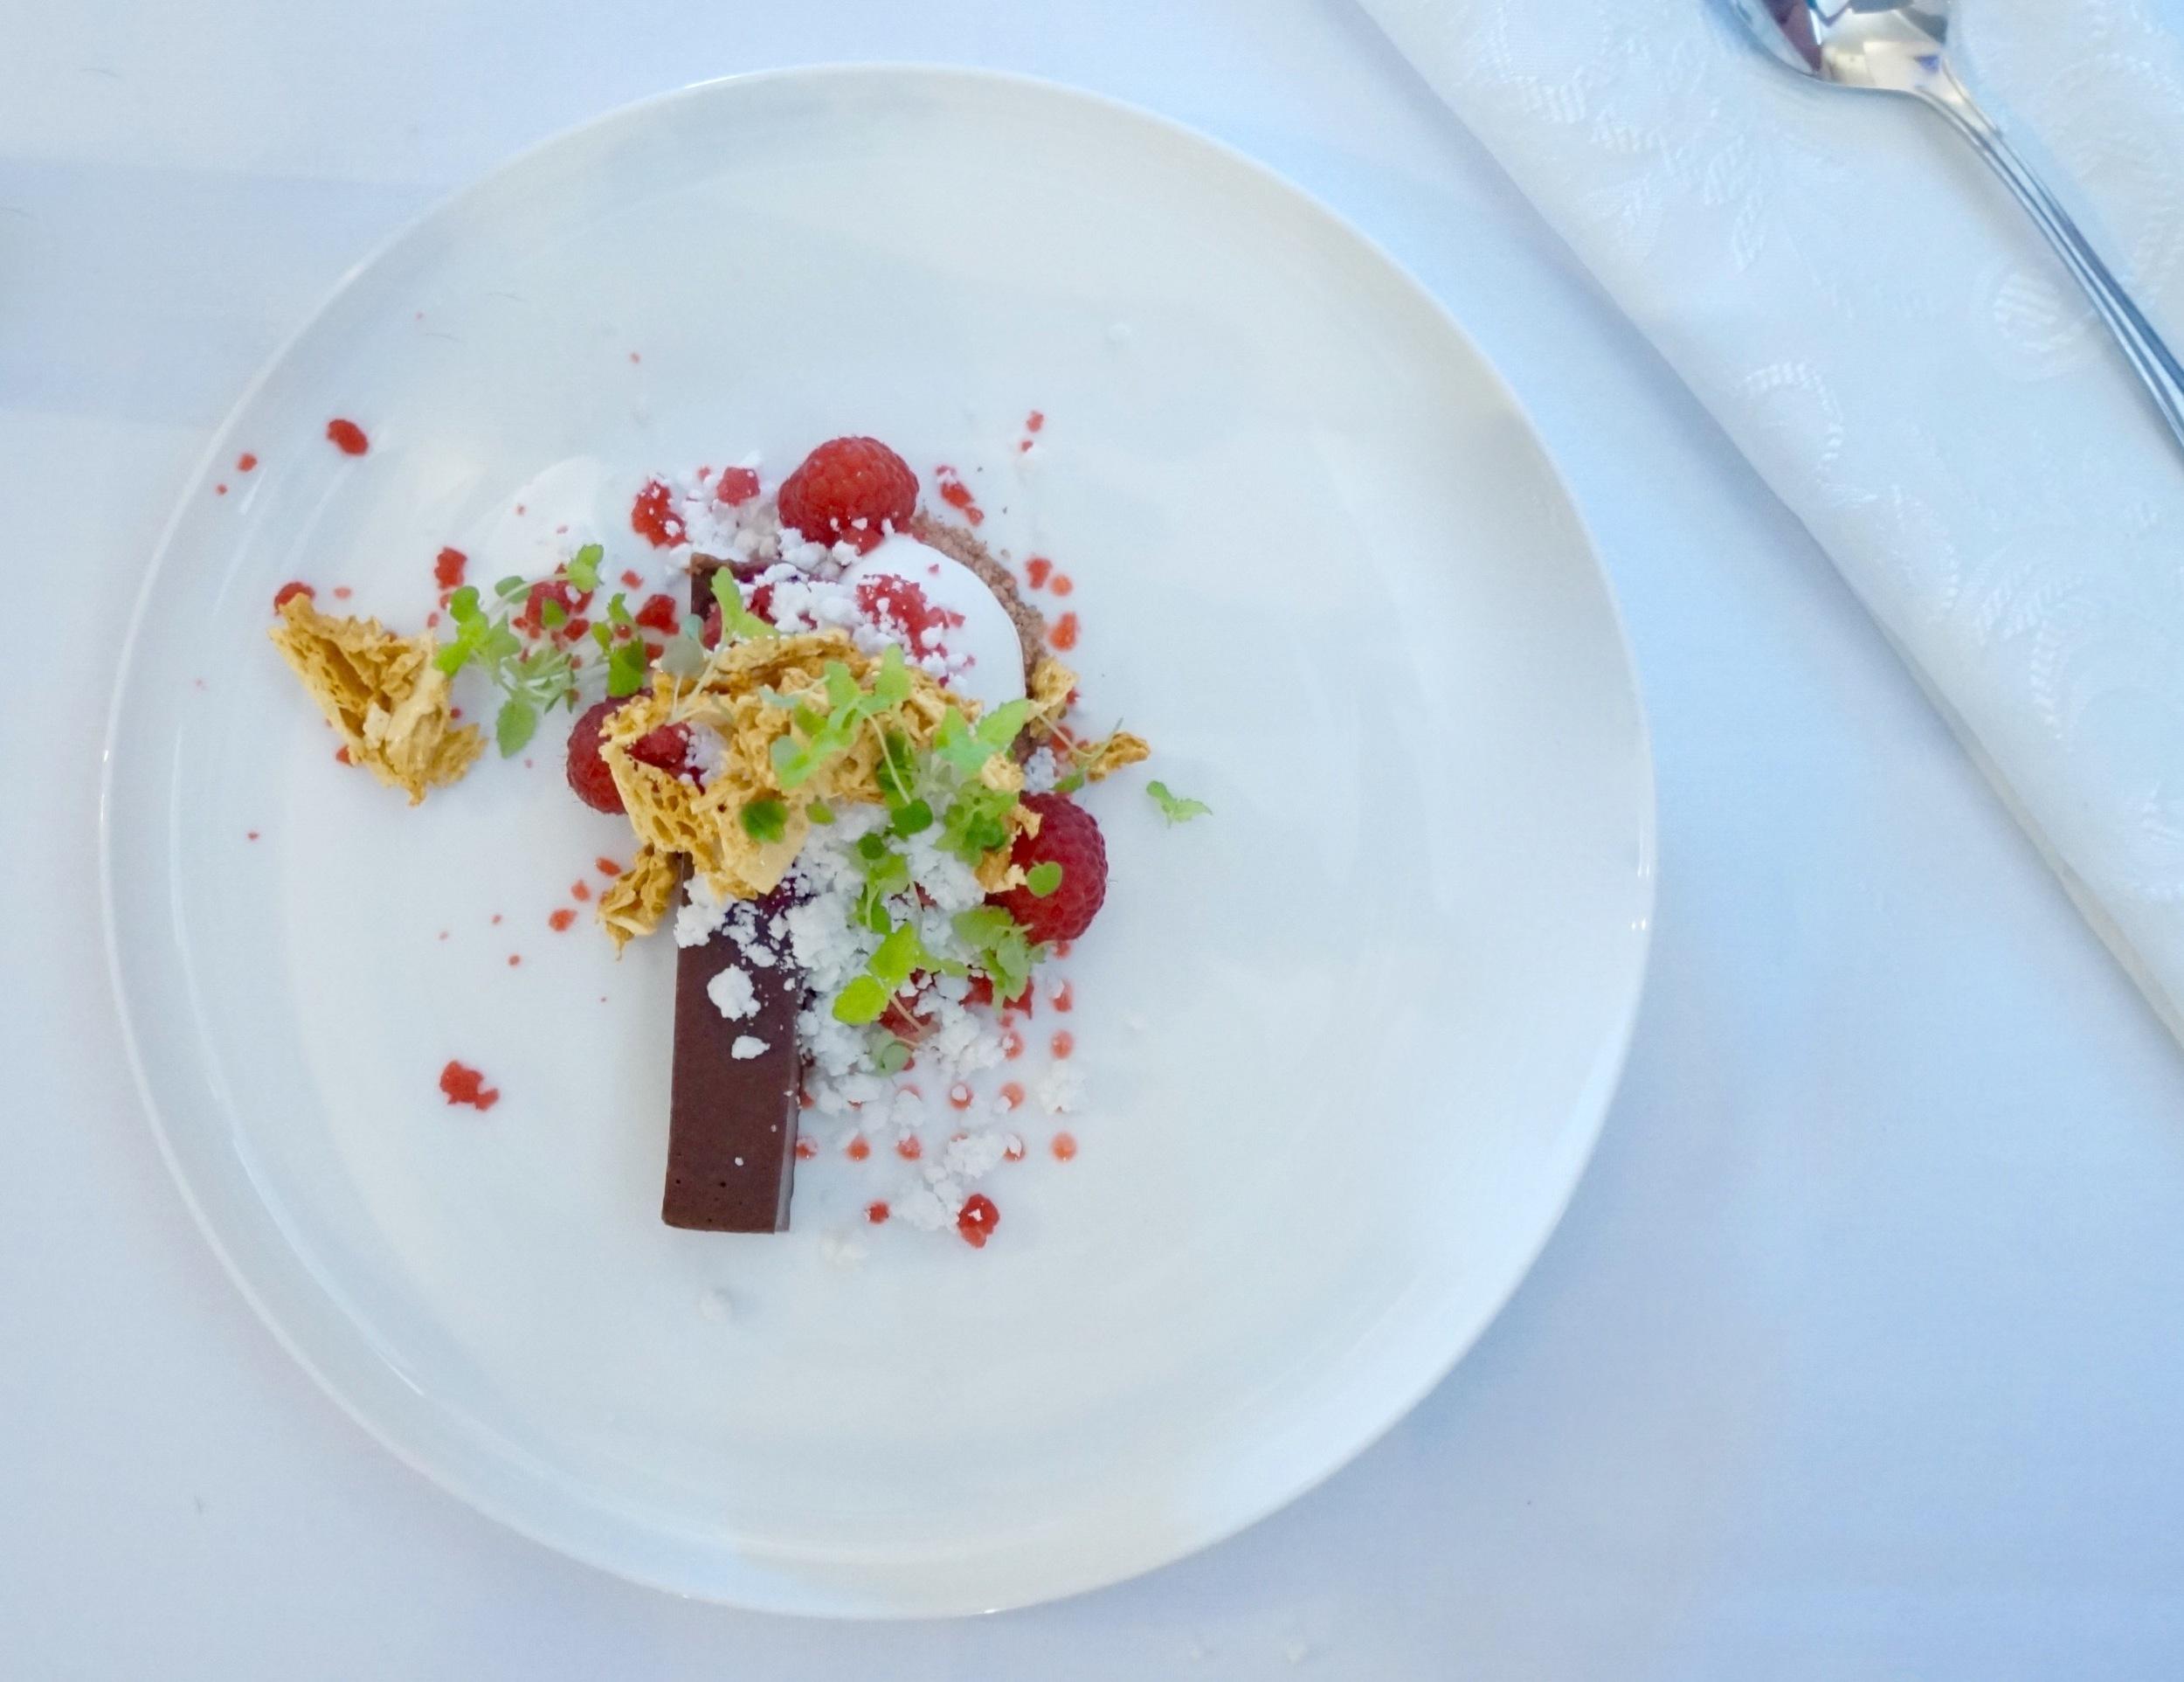 ZOKOKO CHOCOLATE TART, COCONUT SORBET, RASPBERRY ICE, HONEYCOMB, MICRO LEMON BALM